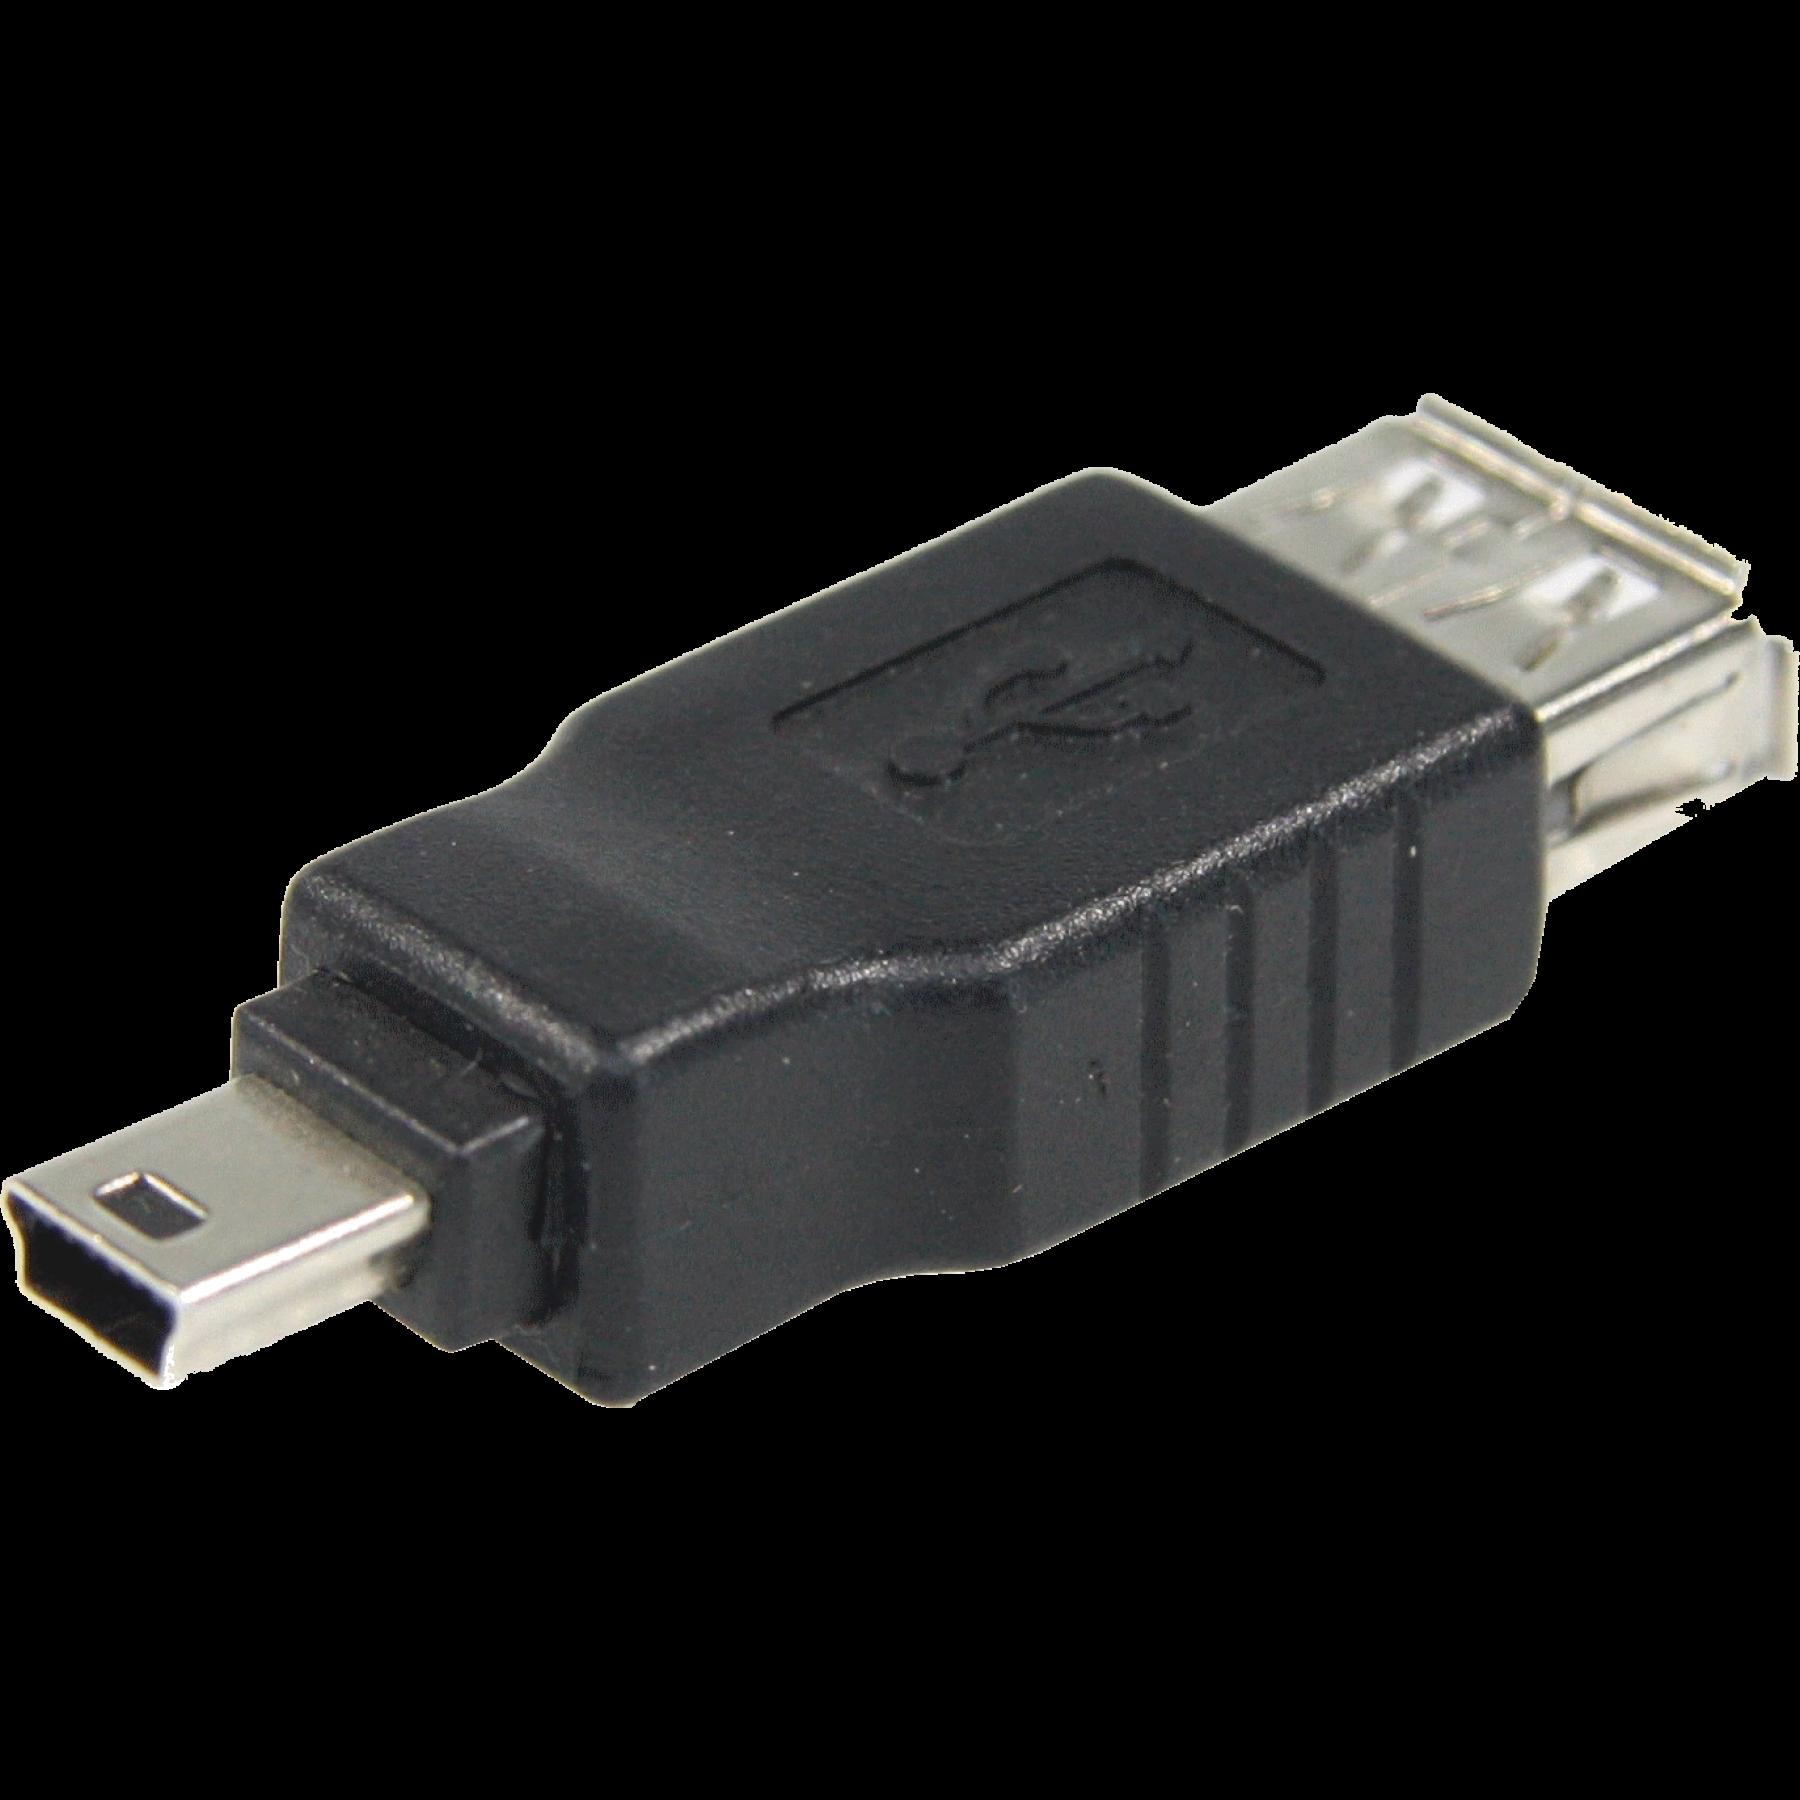 USB Adapter USB naar Mini USB